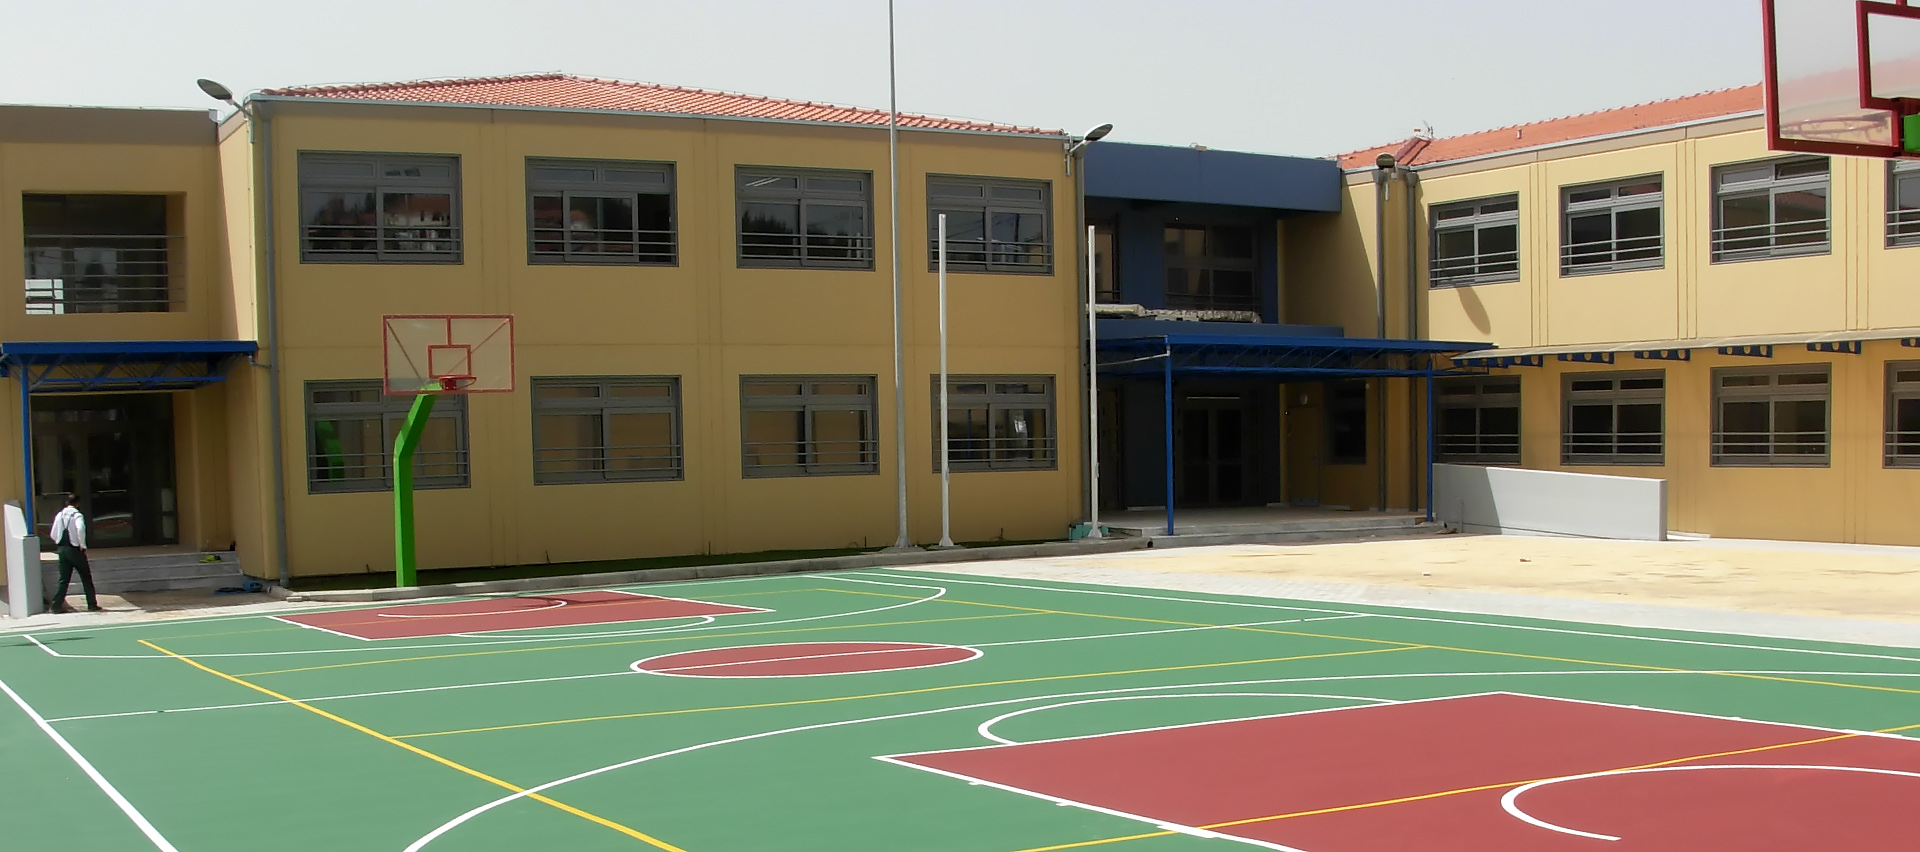 1ᵒ Δημοτικό Σχολείο Ελασσόνας cover image